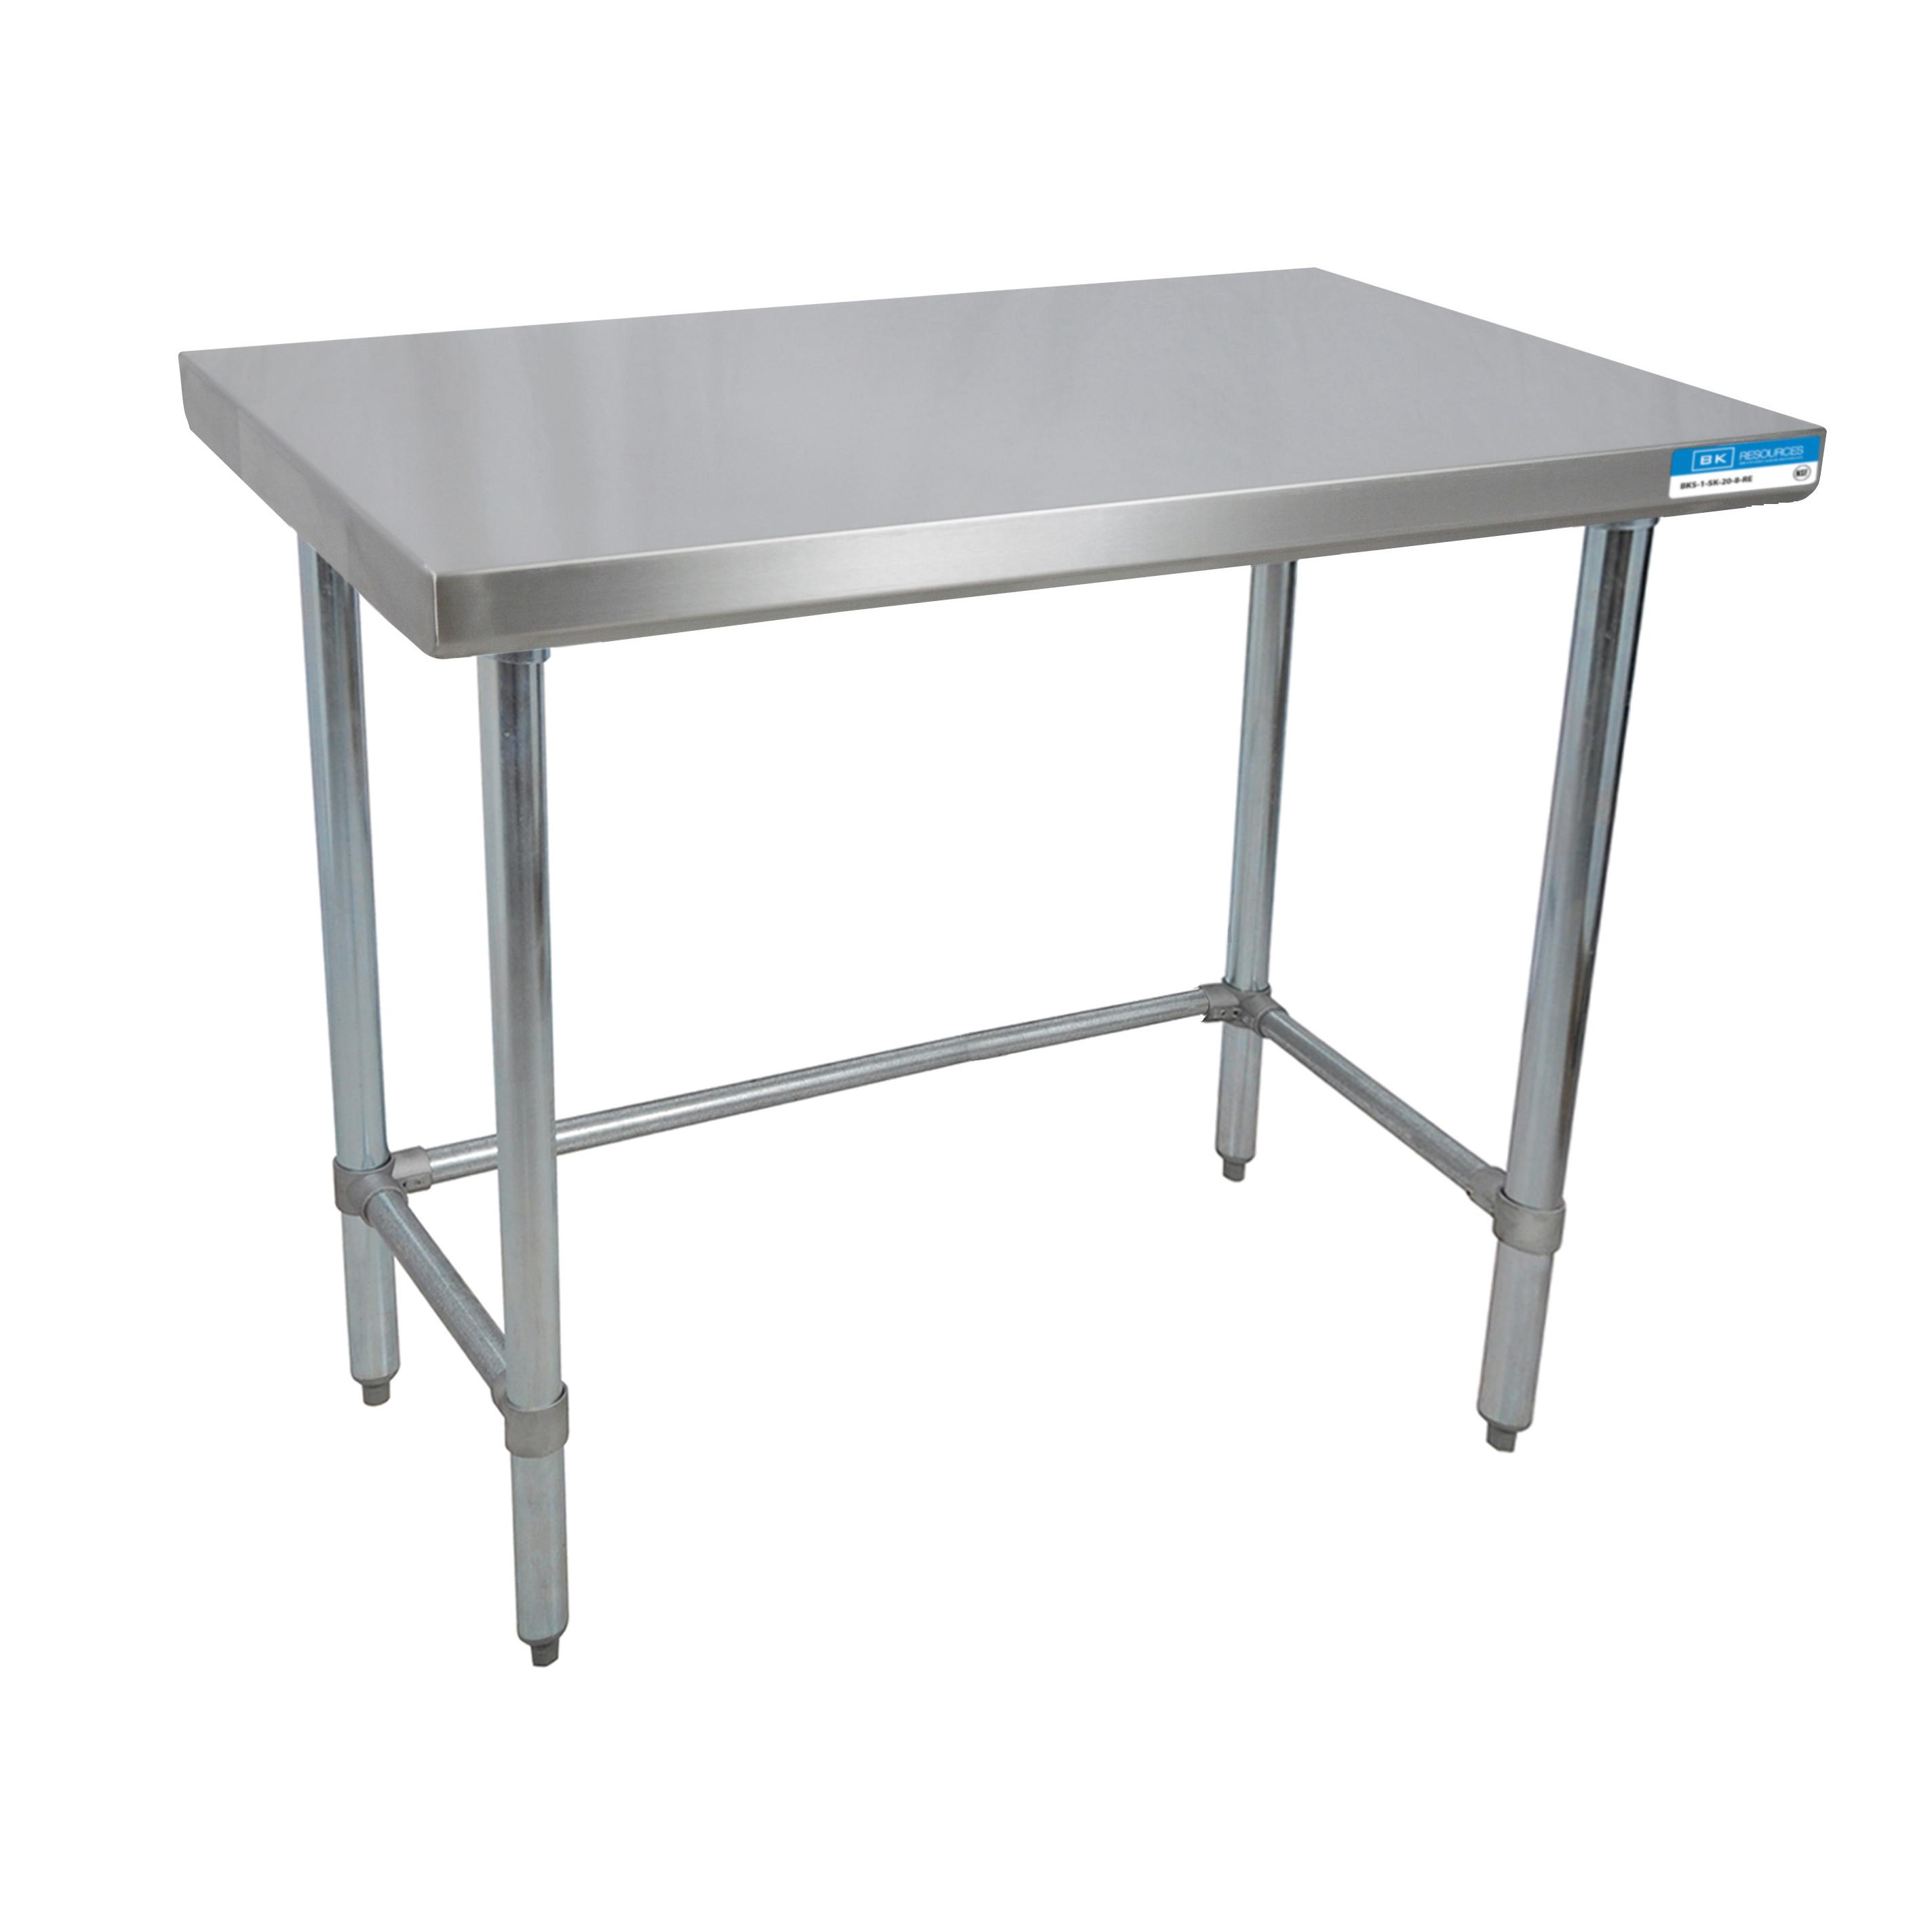 BK Resources QVTOB-3636 work table,  36